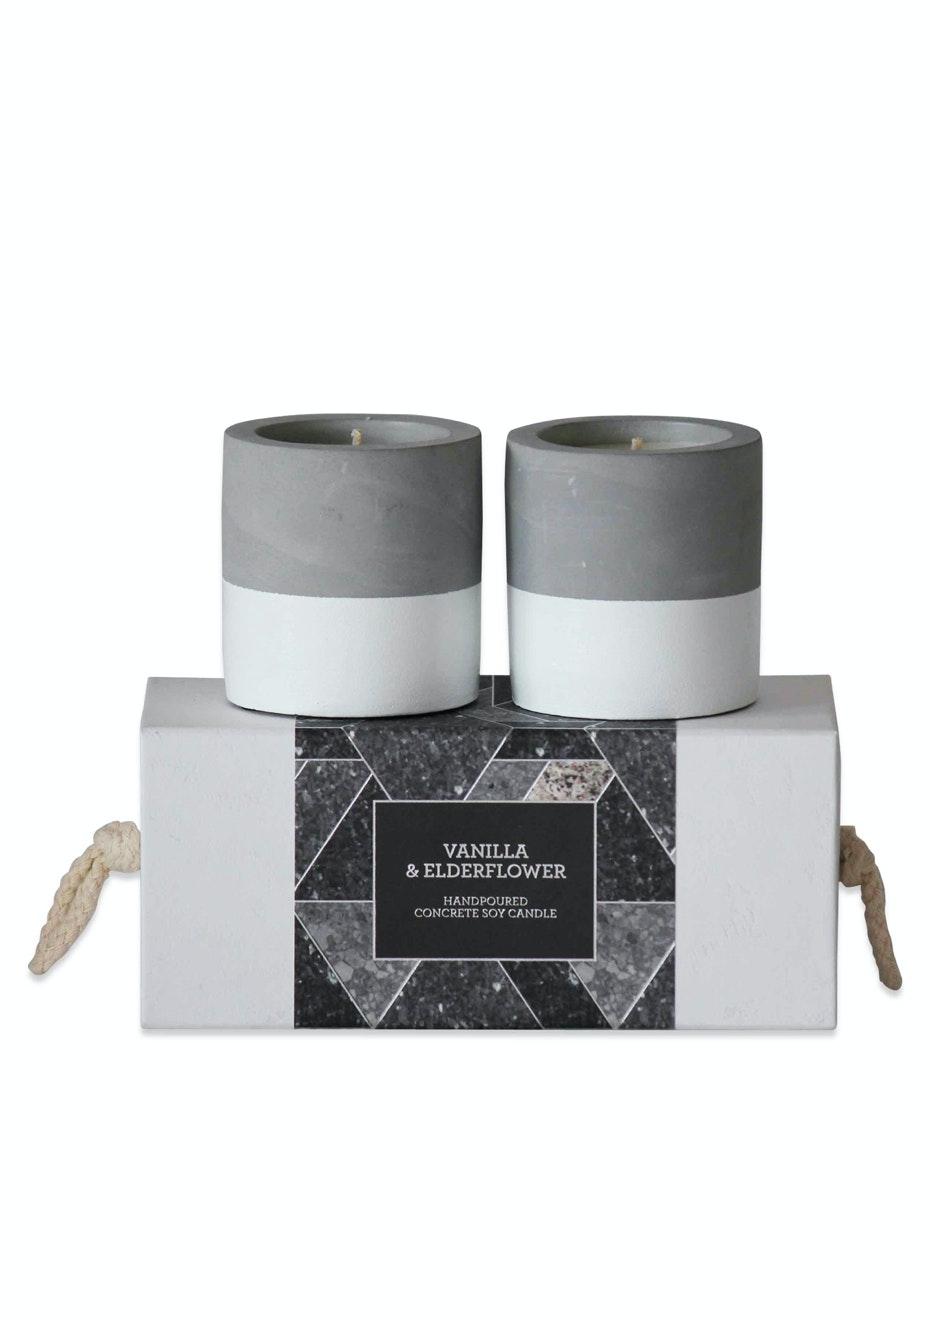 Me & My Trend - Set of 2 Concrete Vanilla & Elderflower